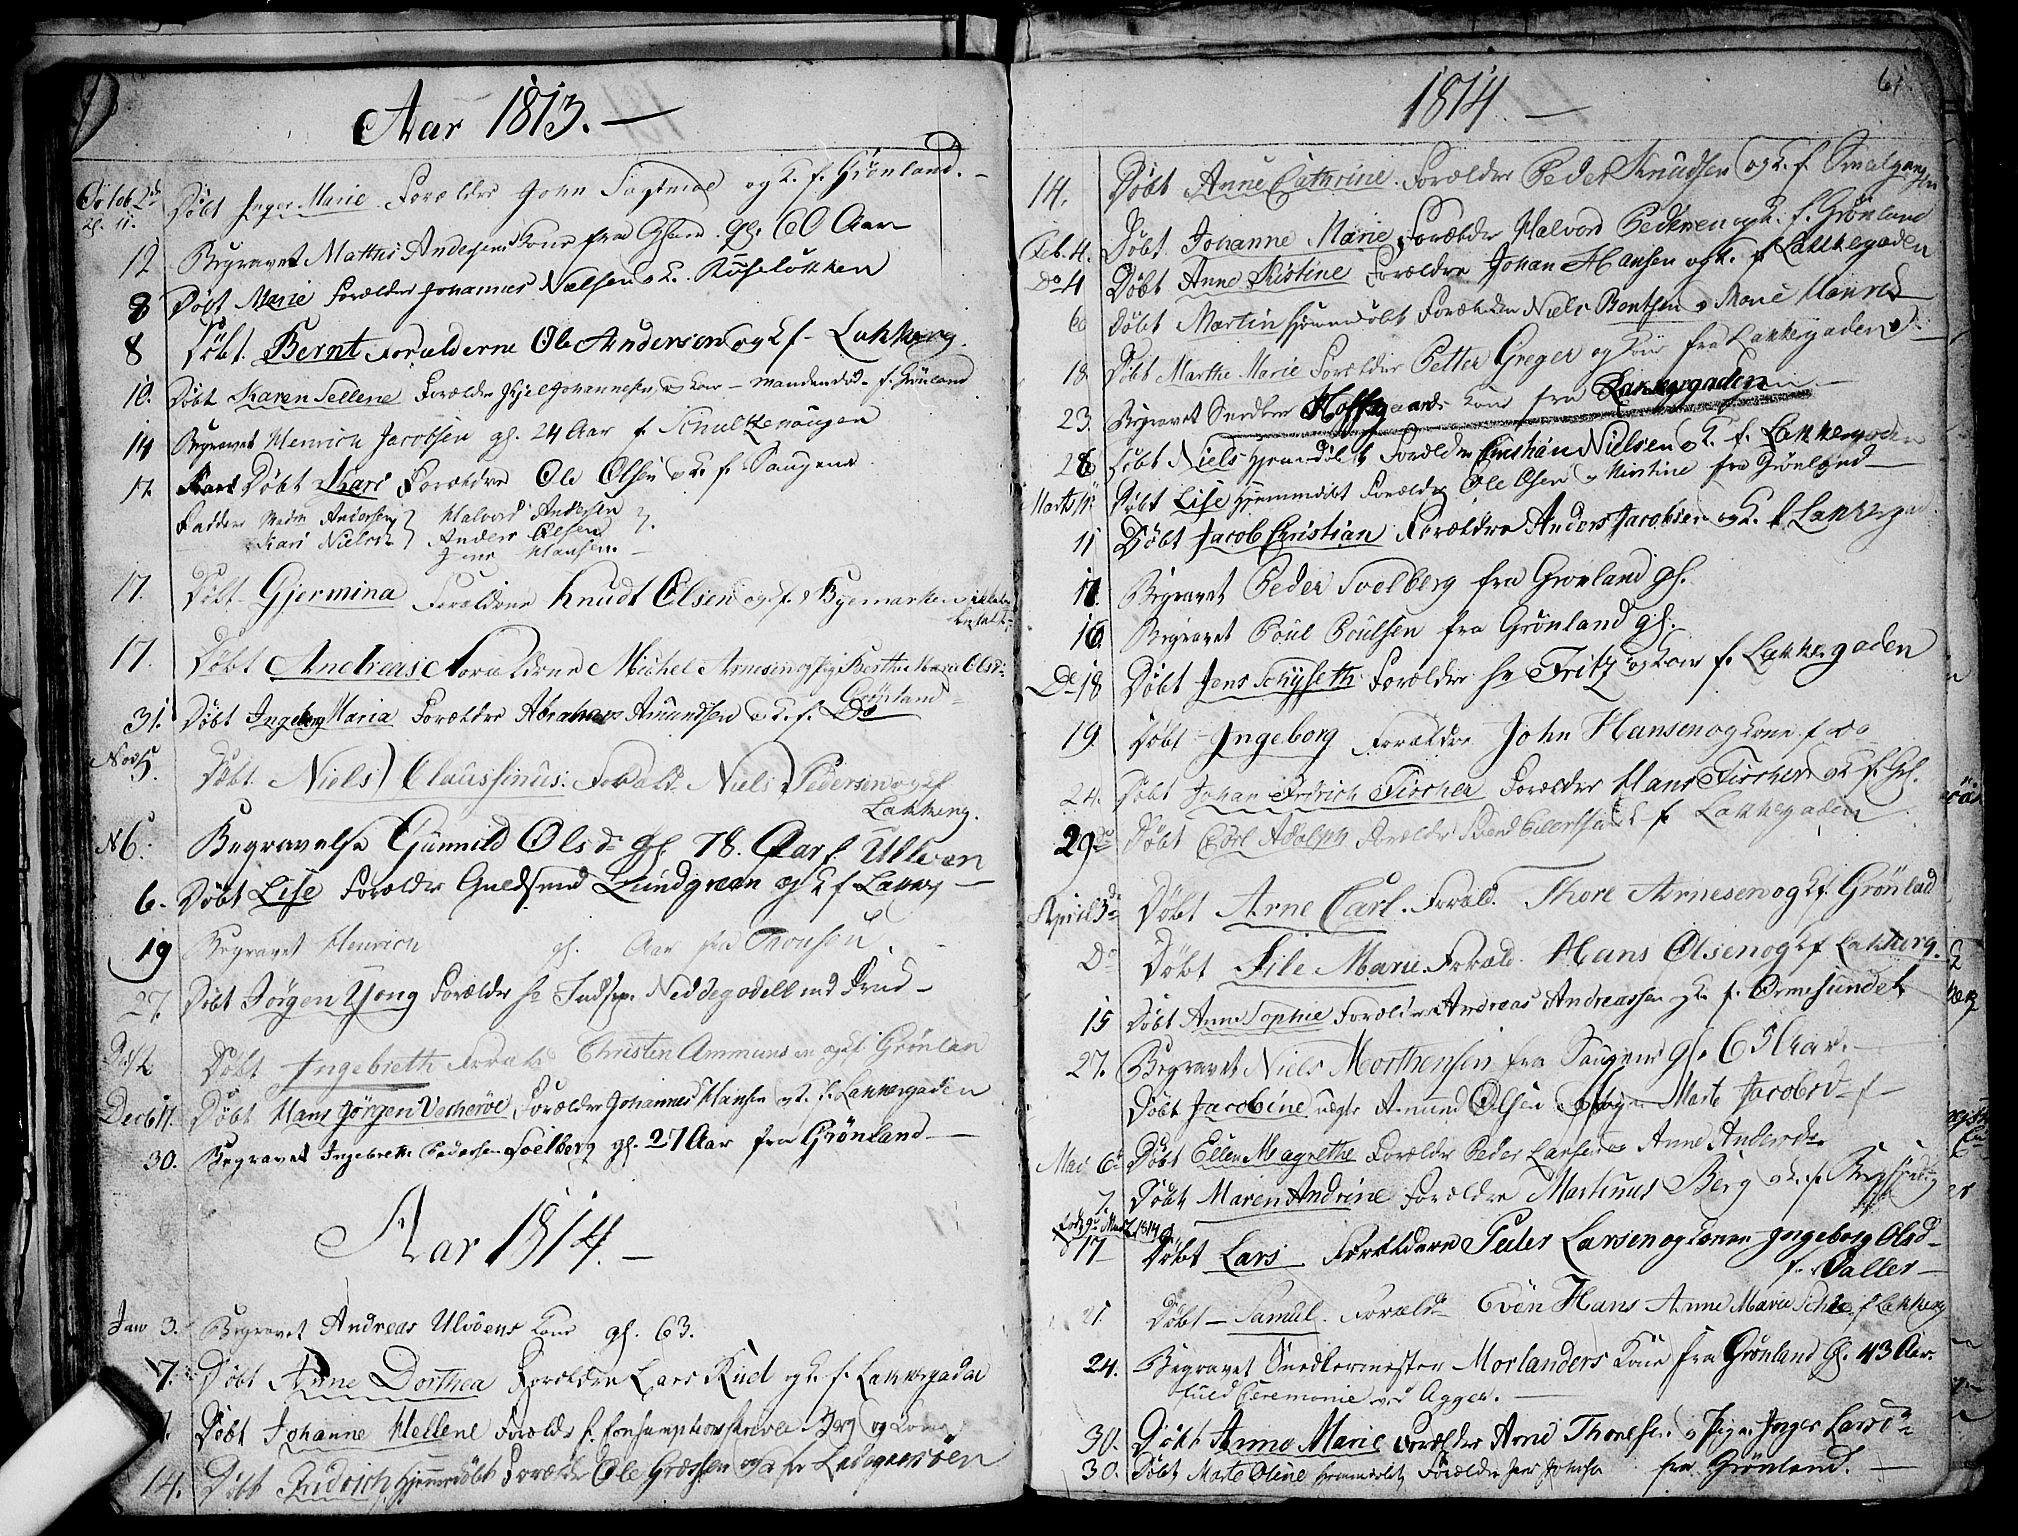 SAO, Aker prestekontor kirkebøker, G/L0001: Parish register (copy) no. 1, 1796-1826, p. 60-61